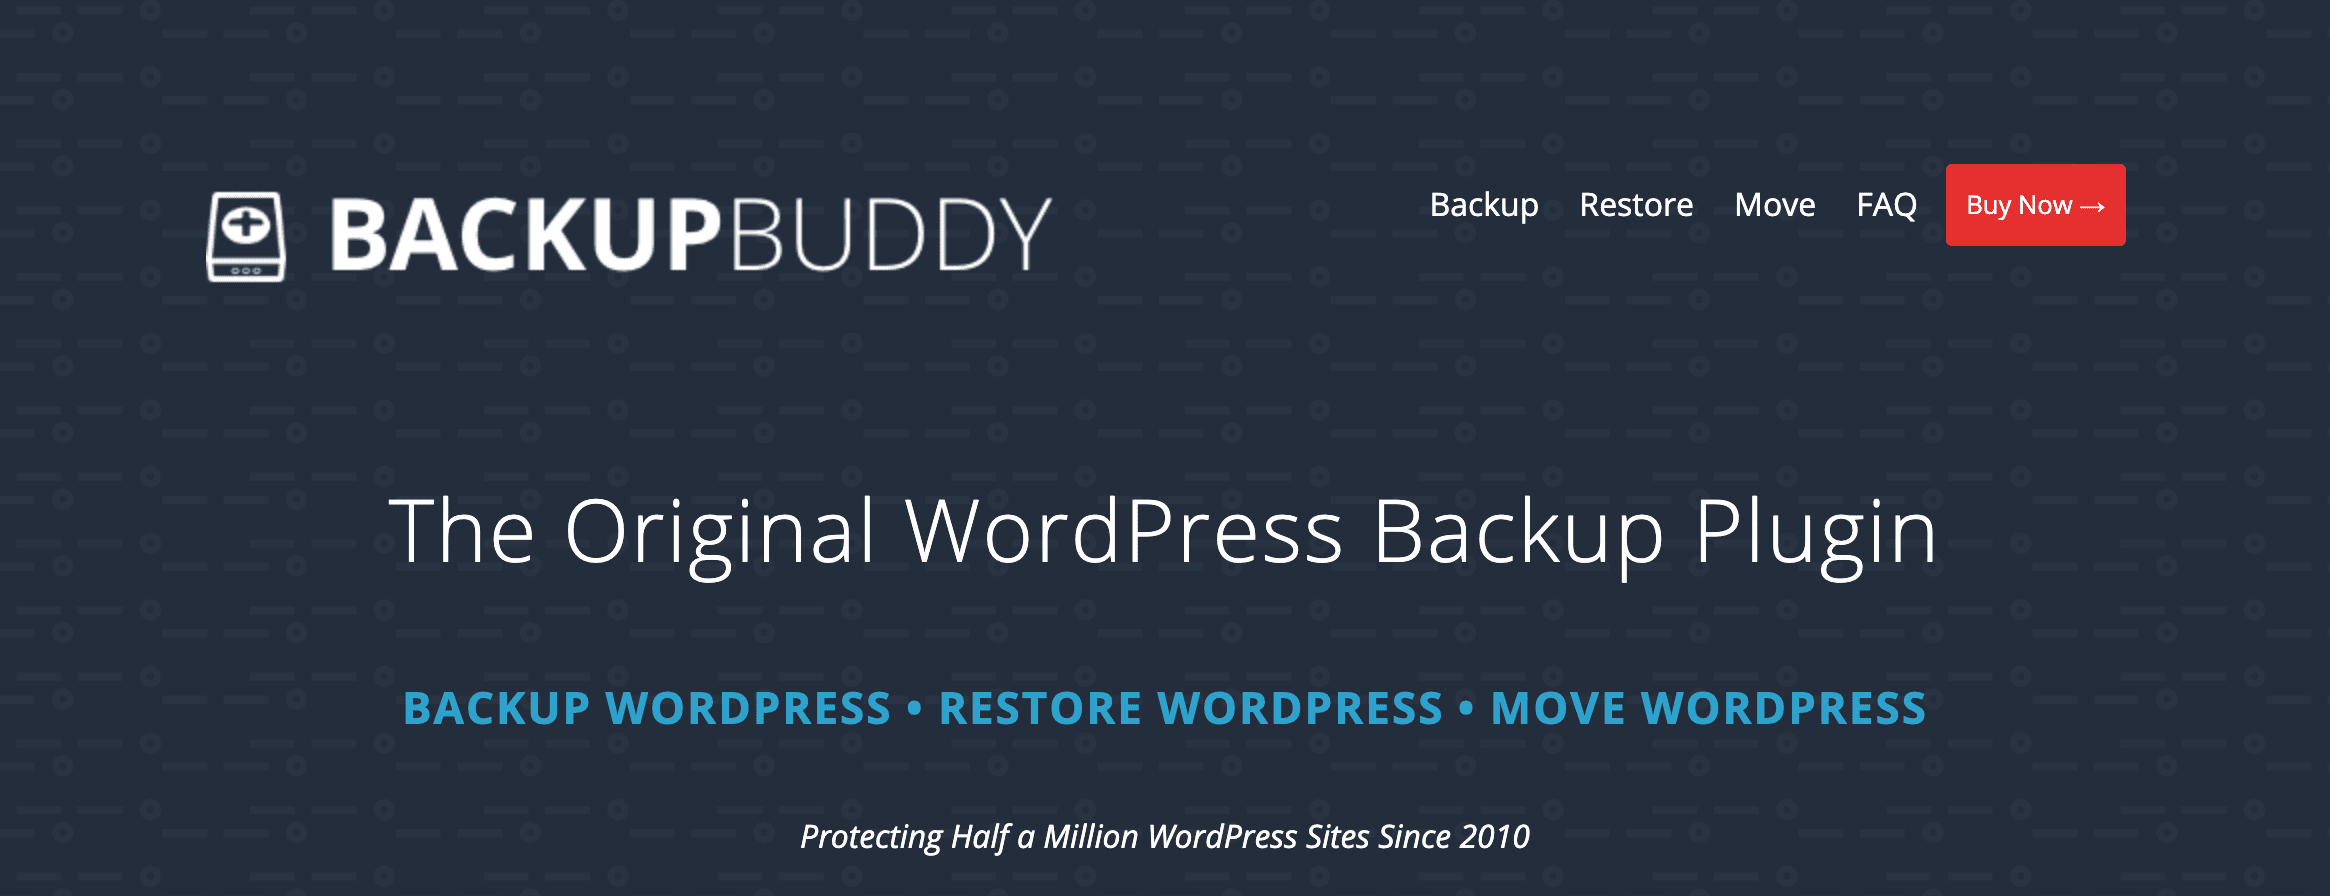 The BackupBuddy plugin.